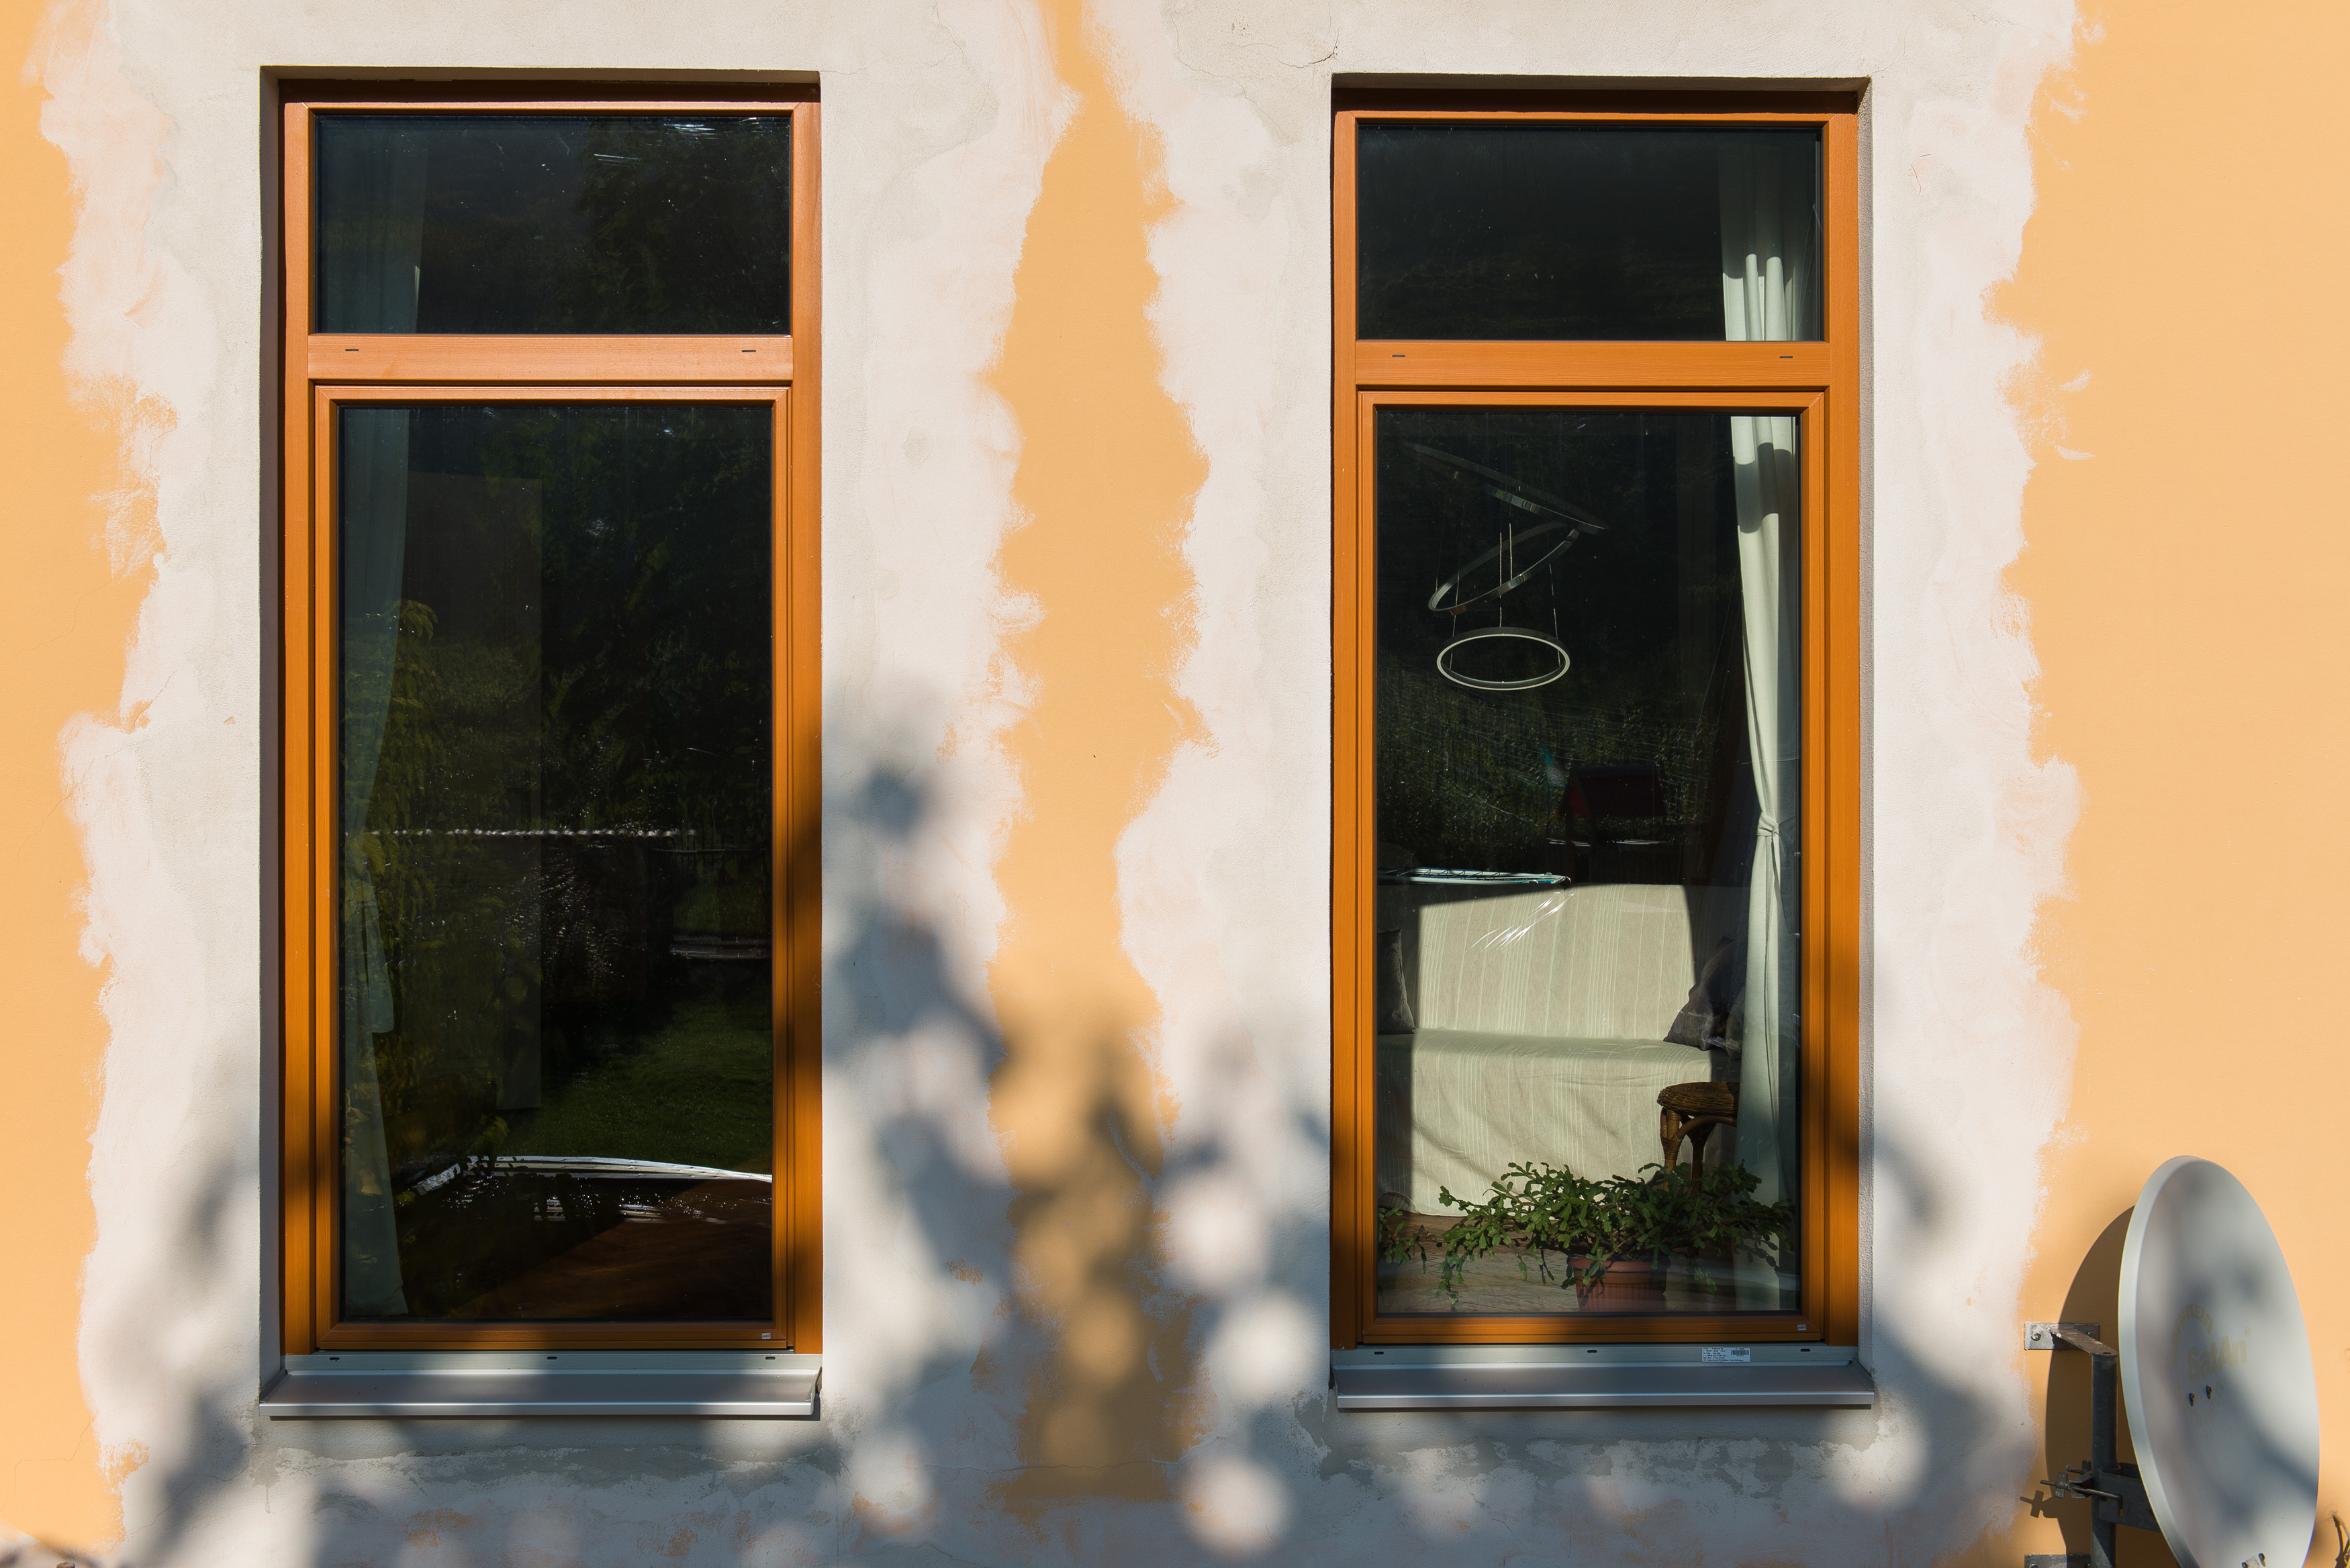 Dreifach verglaste Fenster © Punkt Fünf e.U./Martin Skopal